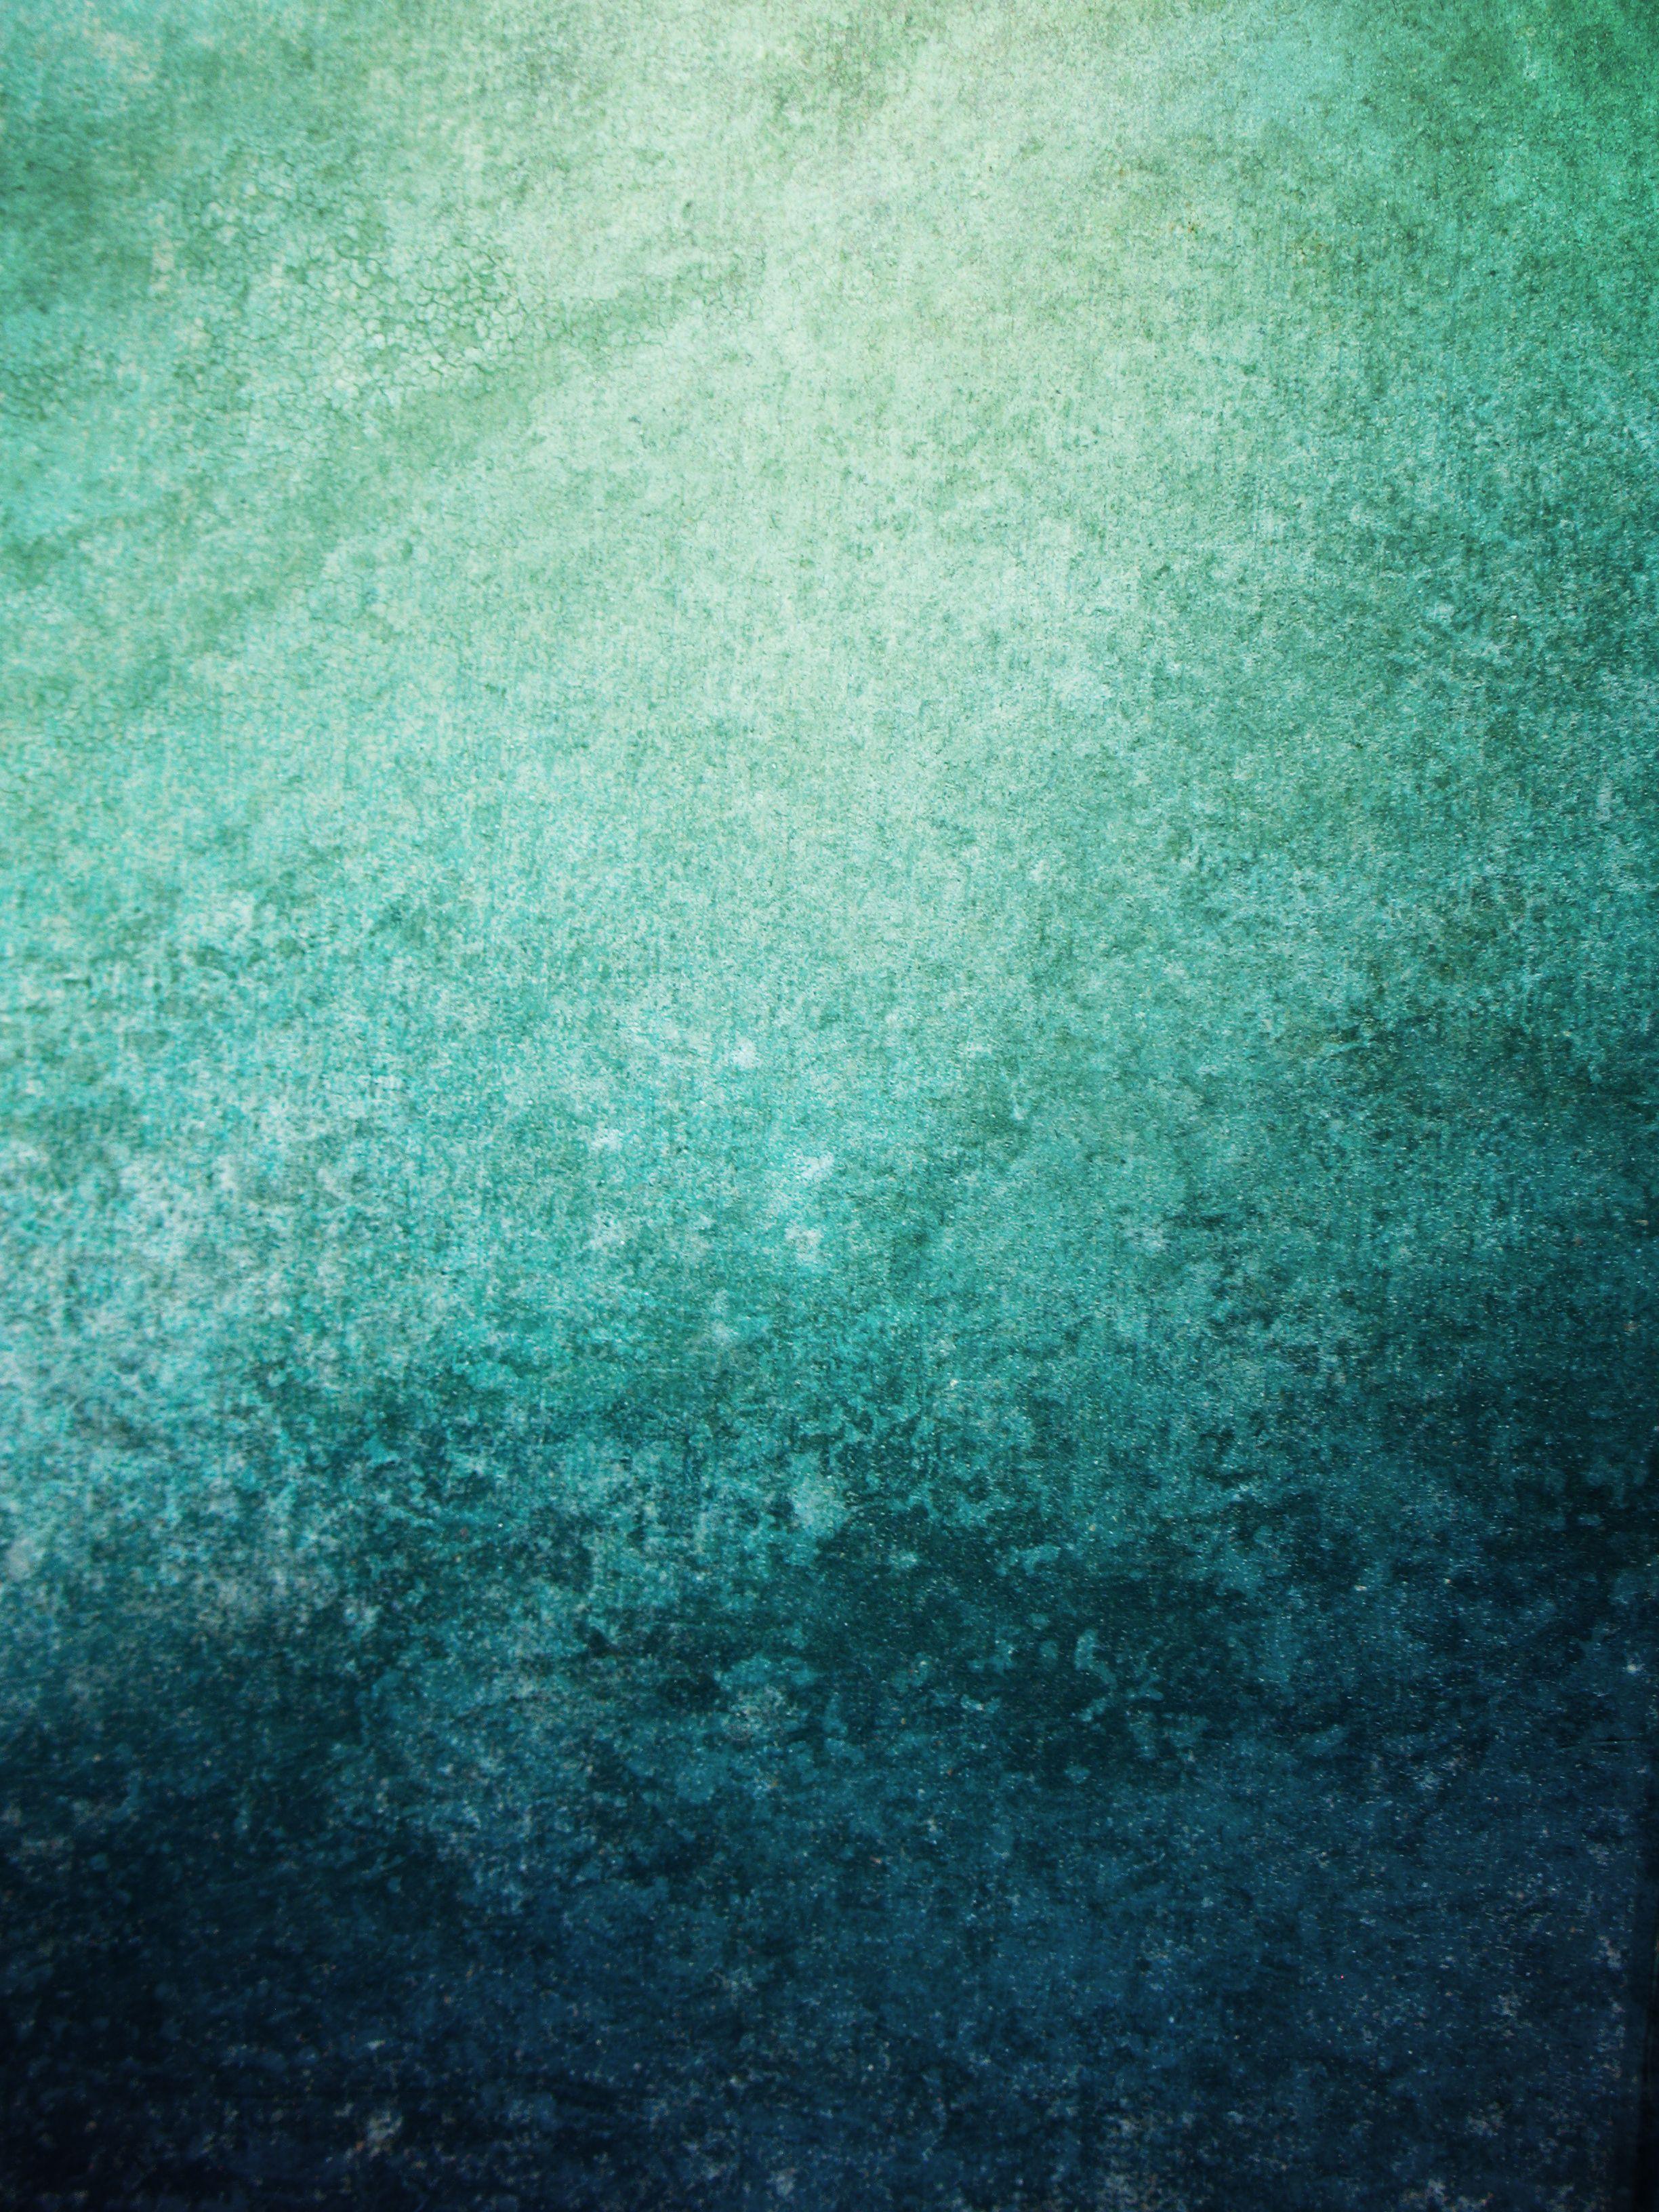 8 Colorful Grunge Textures + L&T News! | Web design ...